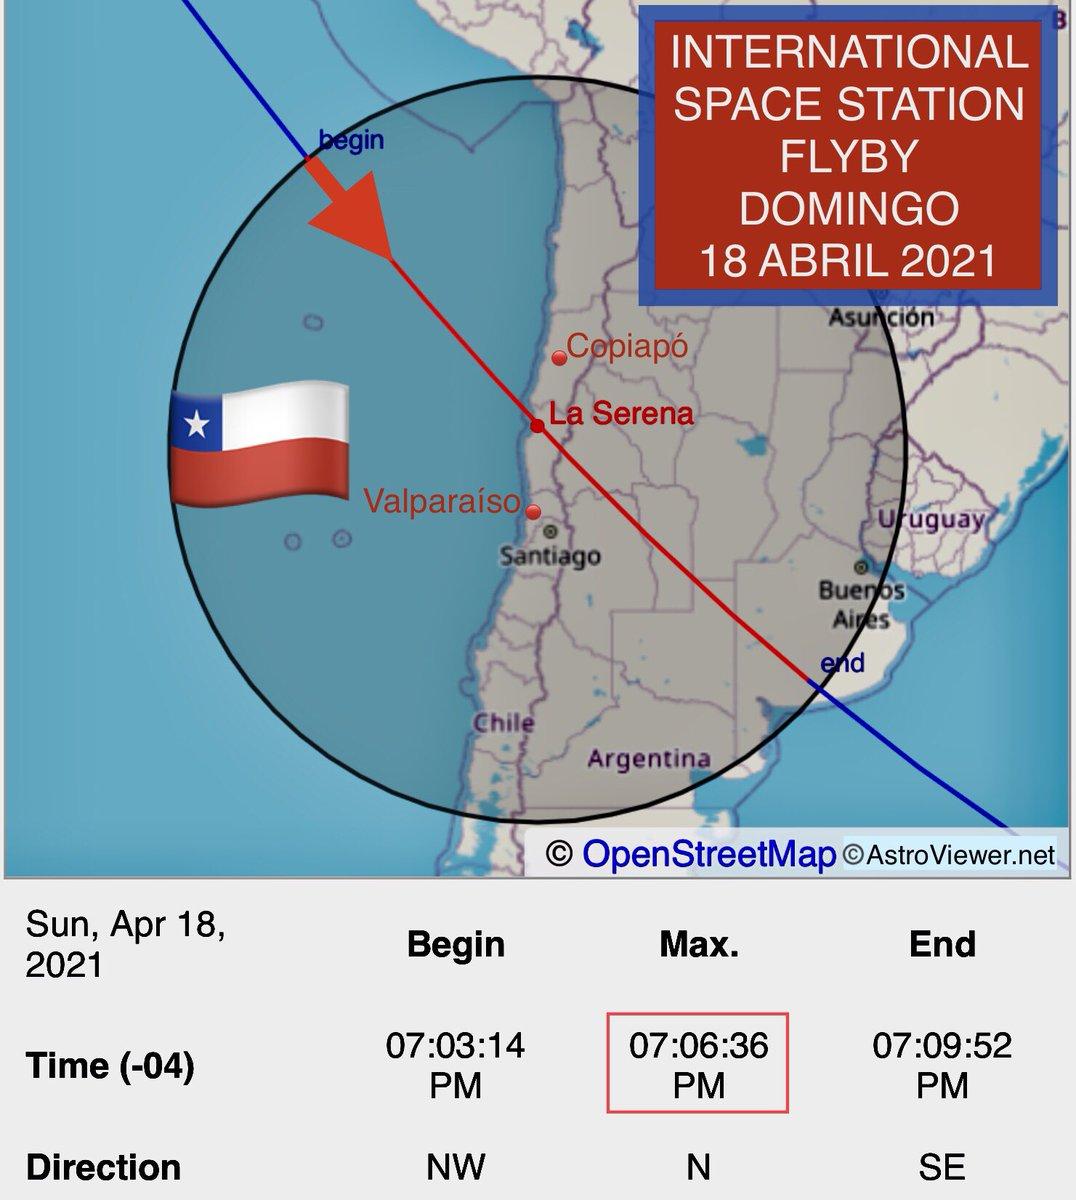 RT @IgnazioMagnani 🇨🇱Atacama 🇨🇱Coquimbo 🇨🇱Valparaíso 🇨🇱RM Santiago La Estación Espacial Internacional se podrá ver hoy a simple vista (si las nubes lo permiten) a las 19:06     📲pon alarma   📲toma foto   👨🚀65 https://t.co/fI01cZu979 🌎Yo https://t.co/AvRldva3HX 📸ESA NASA https://t.co/ObNgNAiuqV